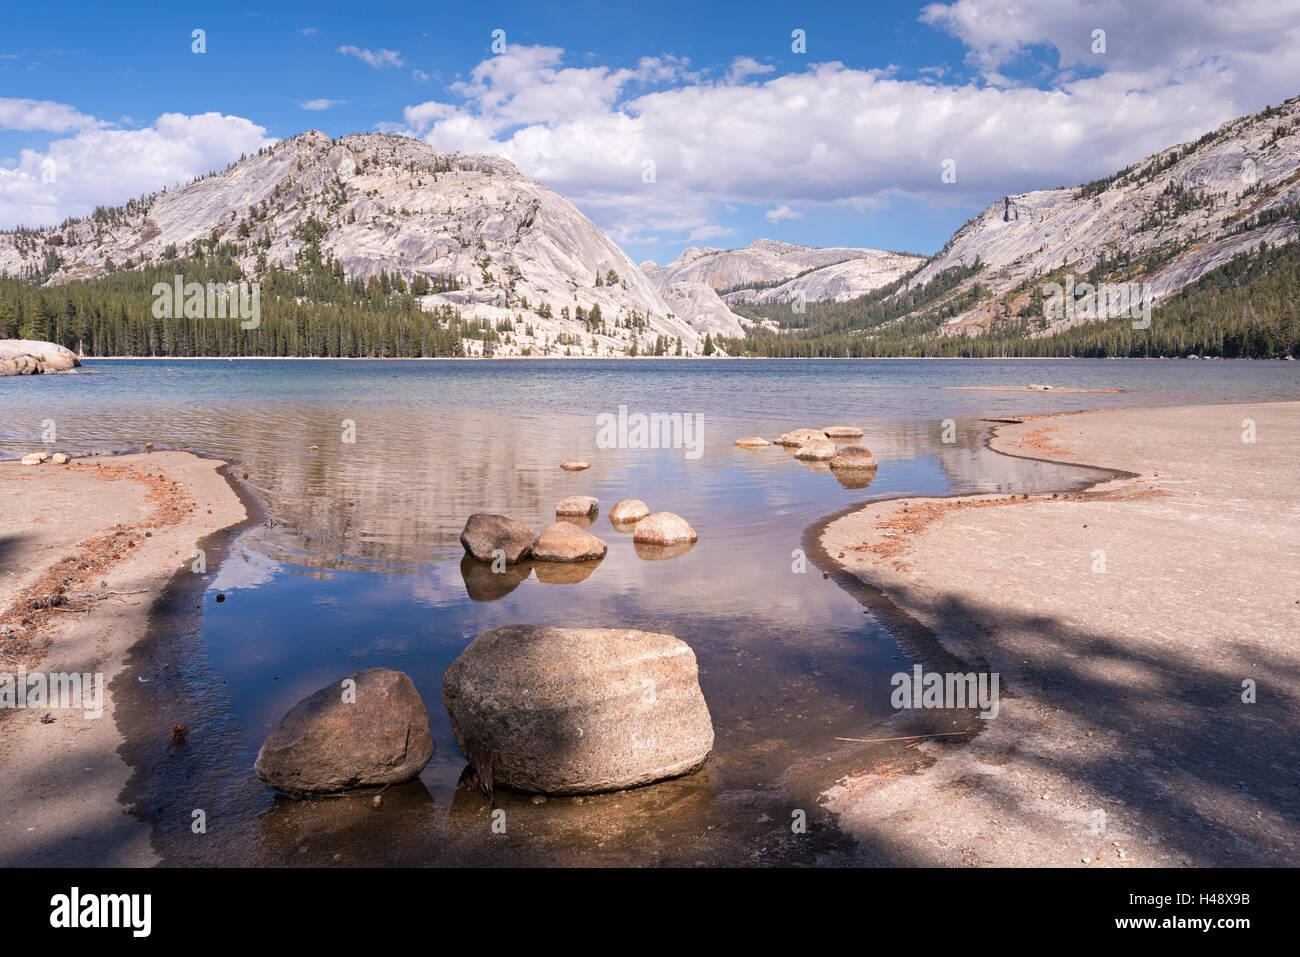 Tenaya See im Yosemite-Nationalpark, Kalifornien, USA.  Herbst (Oktober) 2014. Stockbild